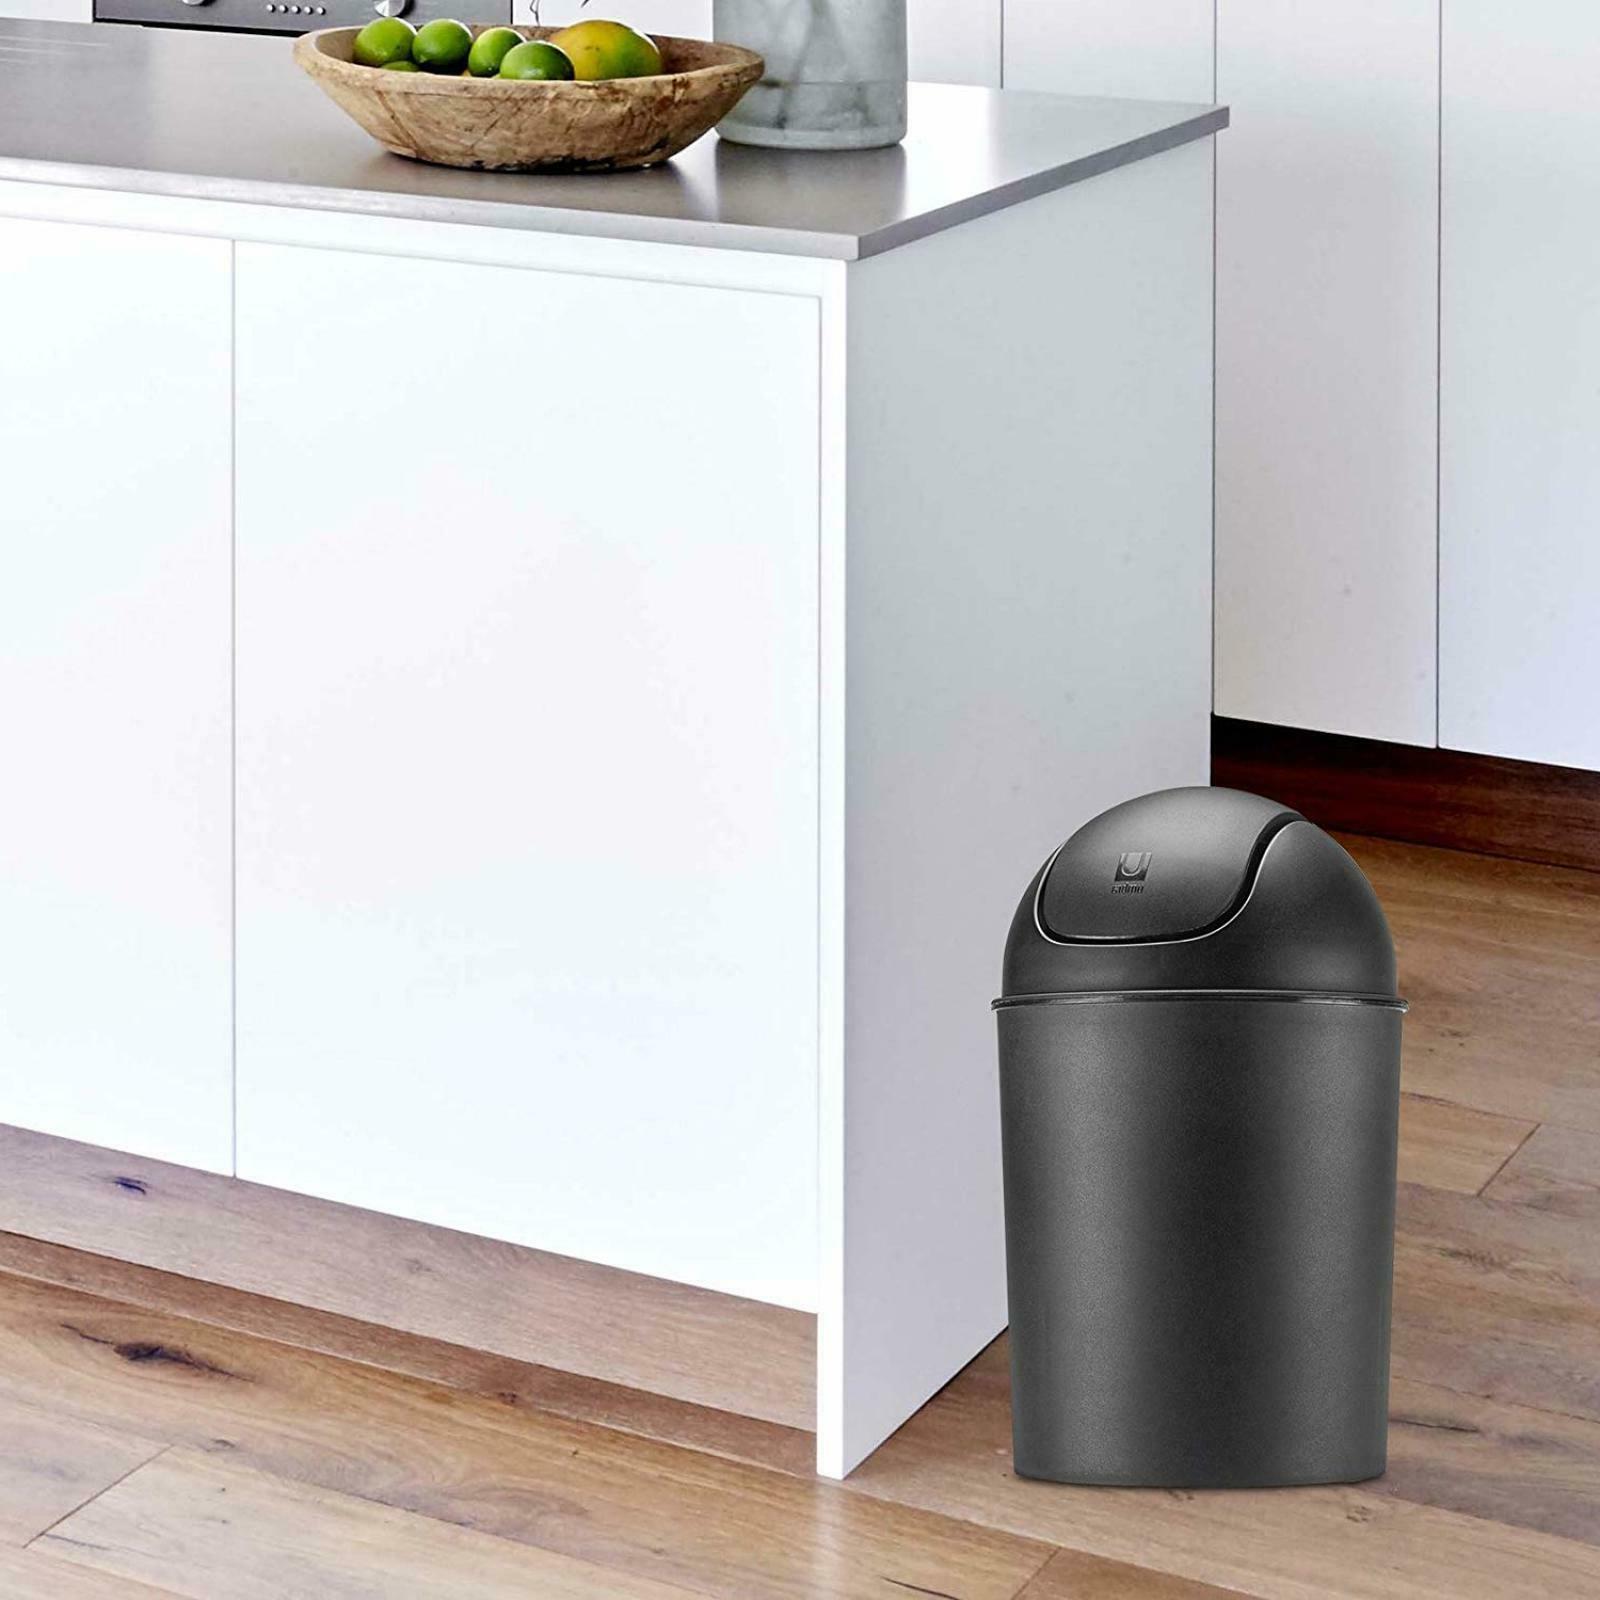 Small Trash Can Plastic Swing Lid Waste Basket 1.5 gallon